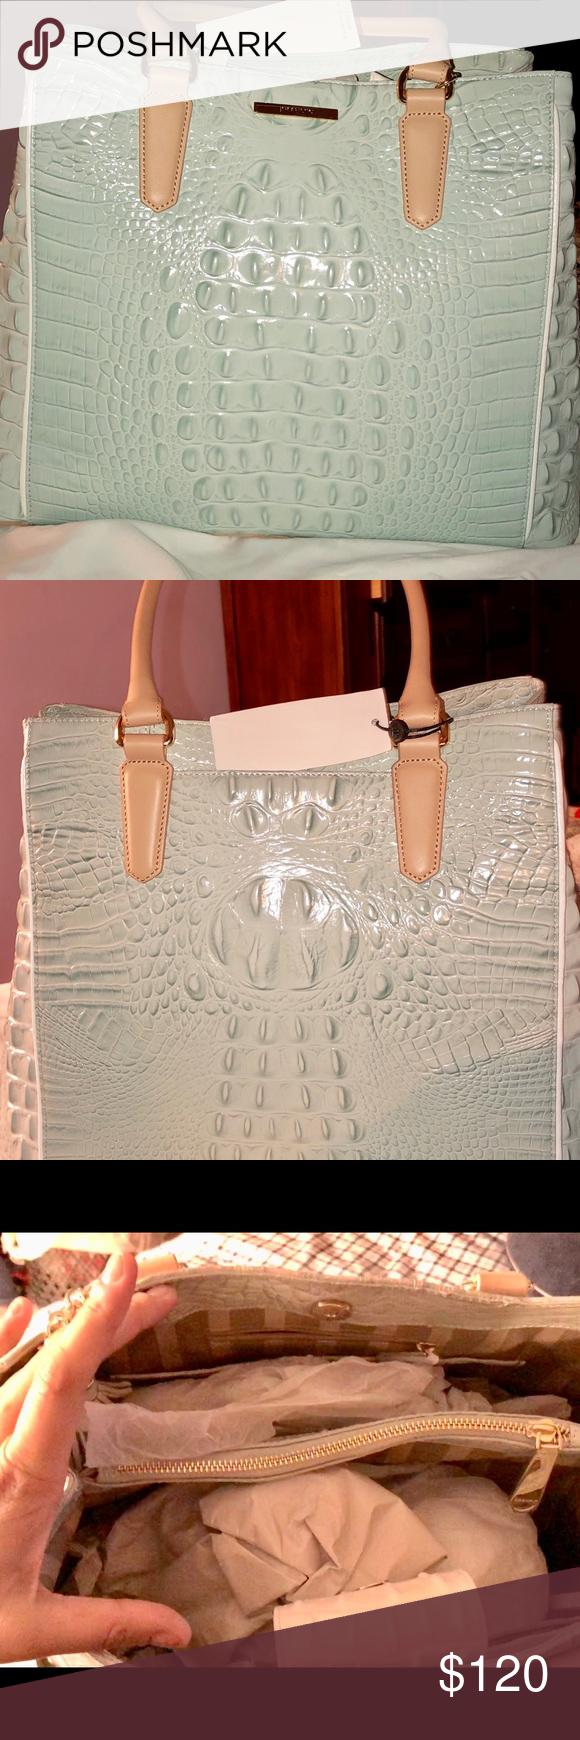 Spotted while shopping on Poshmark  Brahmin Tote Satchel Joan Seaglass  Vineyard New!!  poshmark  fashion  shopping  style  Brahmin  Handbags 471c5d23a6